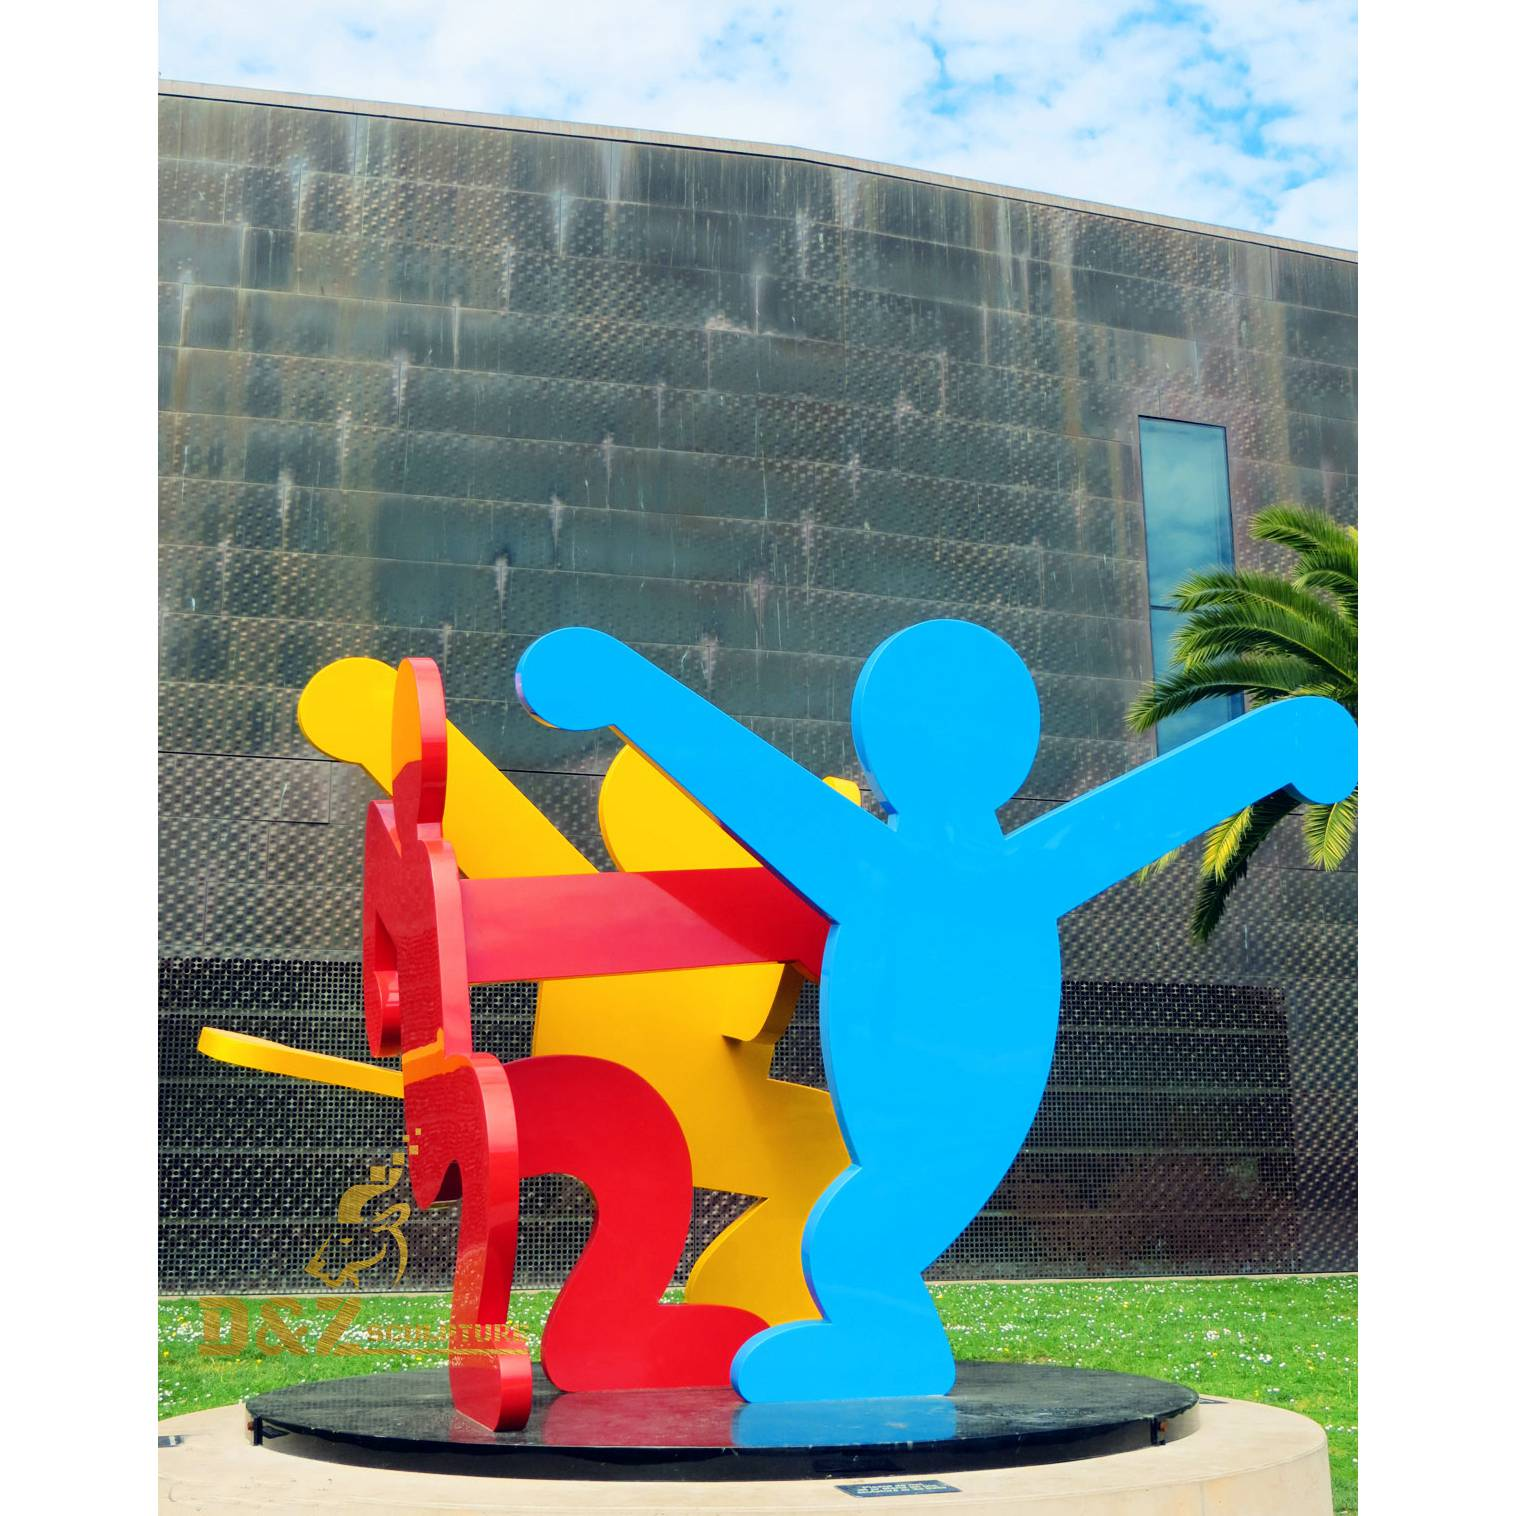 Children's play sculpture